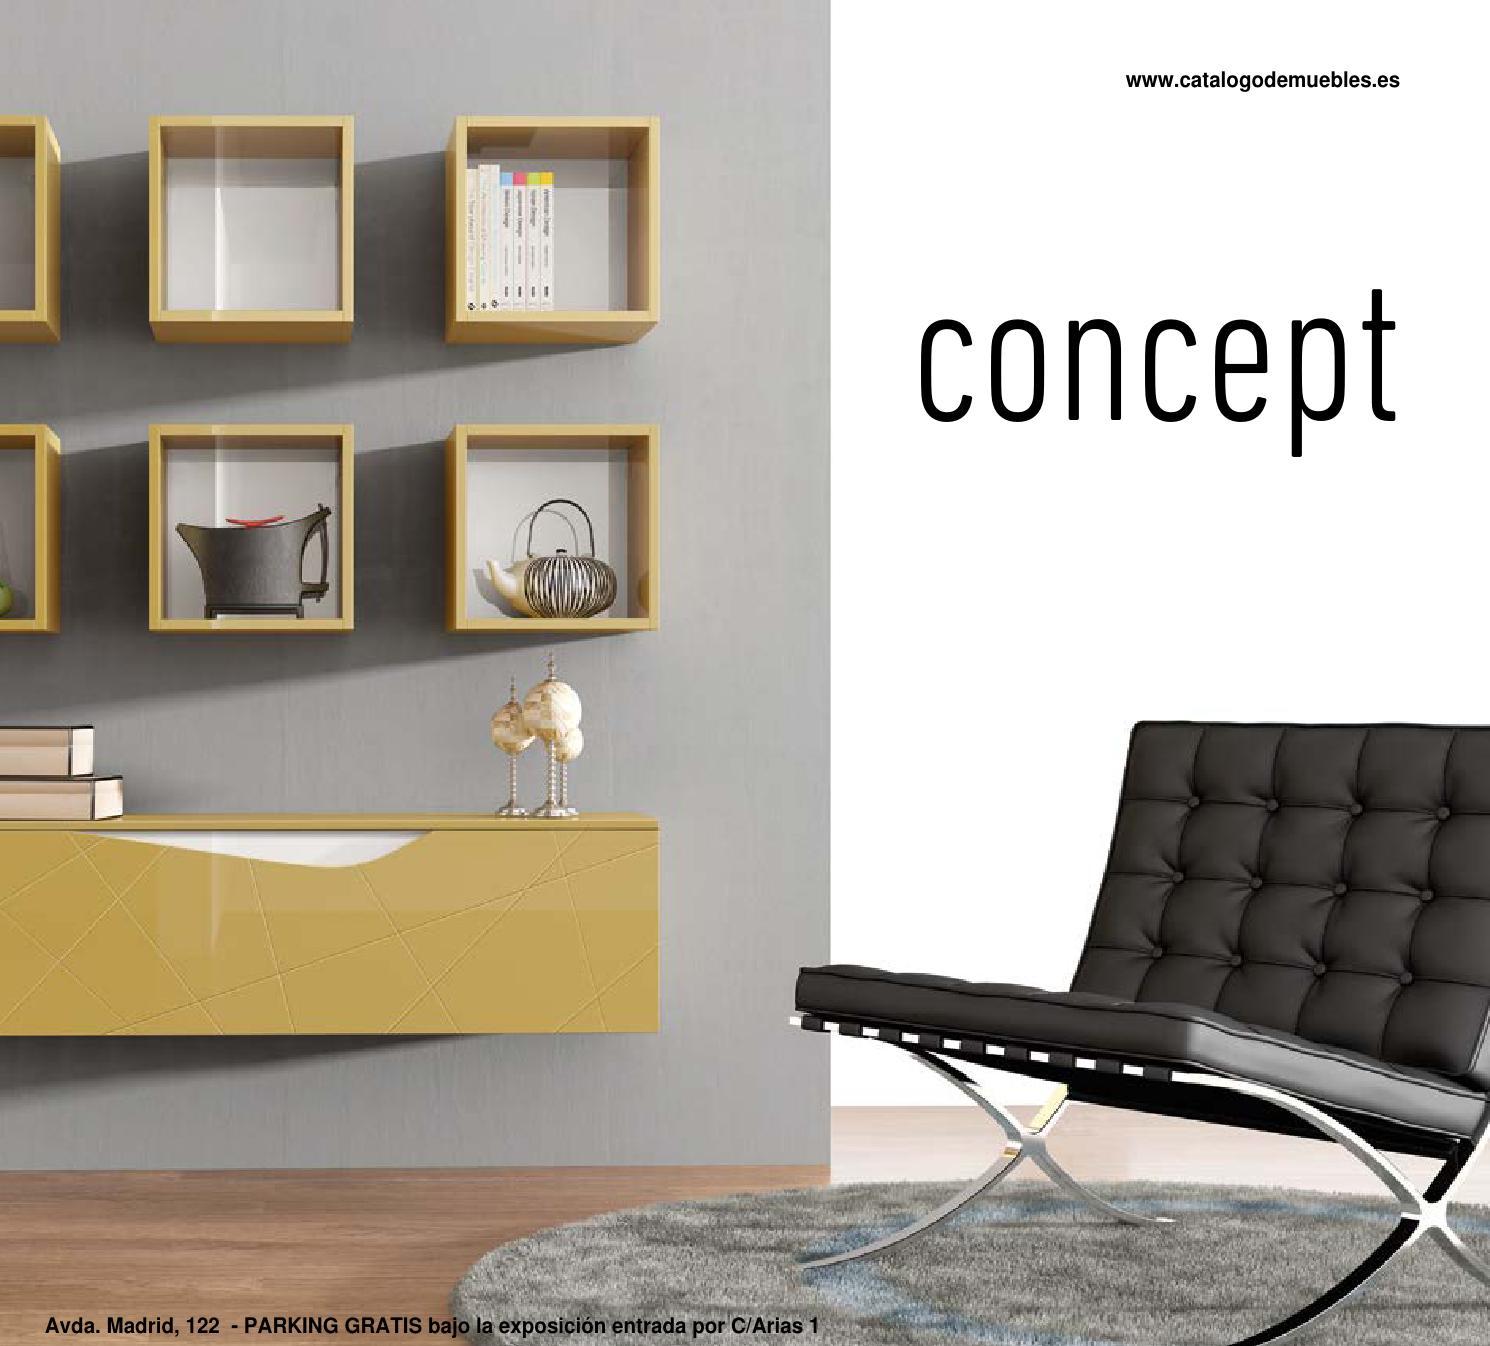 Cat logo sal n moderno colecci n concept by cat logo de - Novedades delicias ...